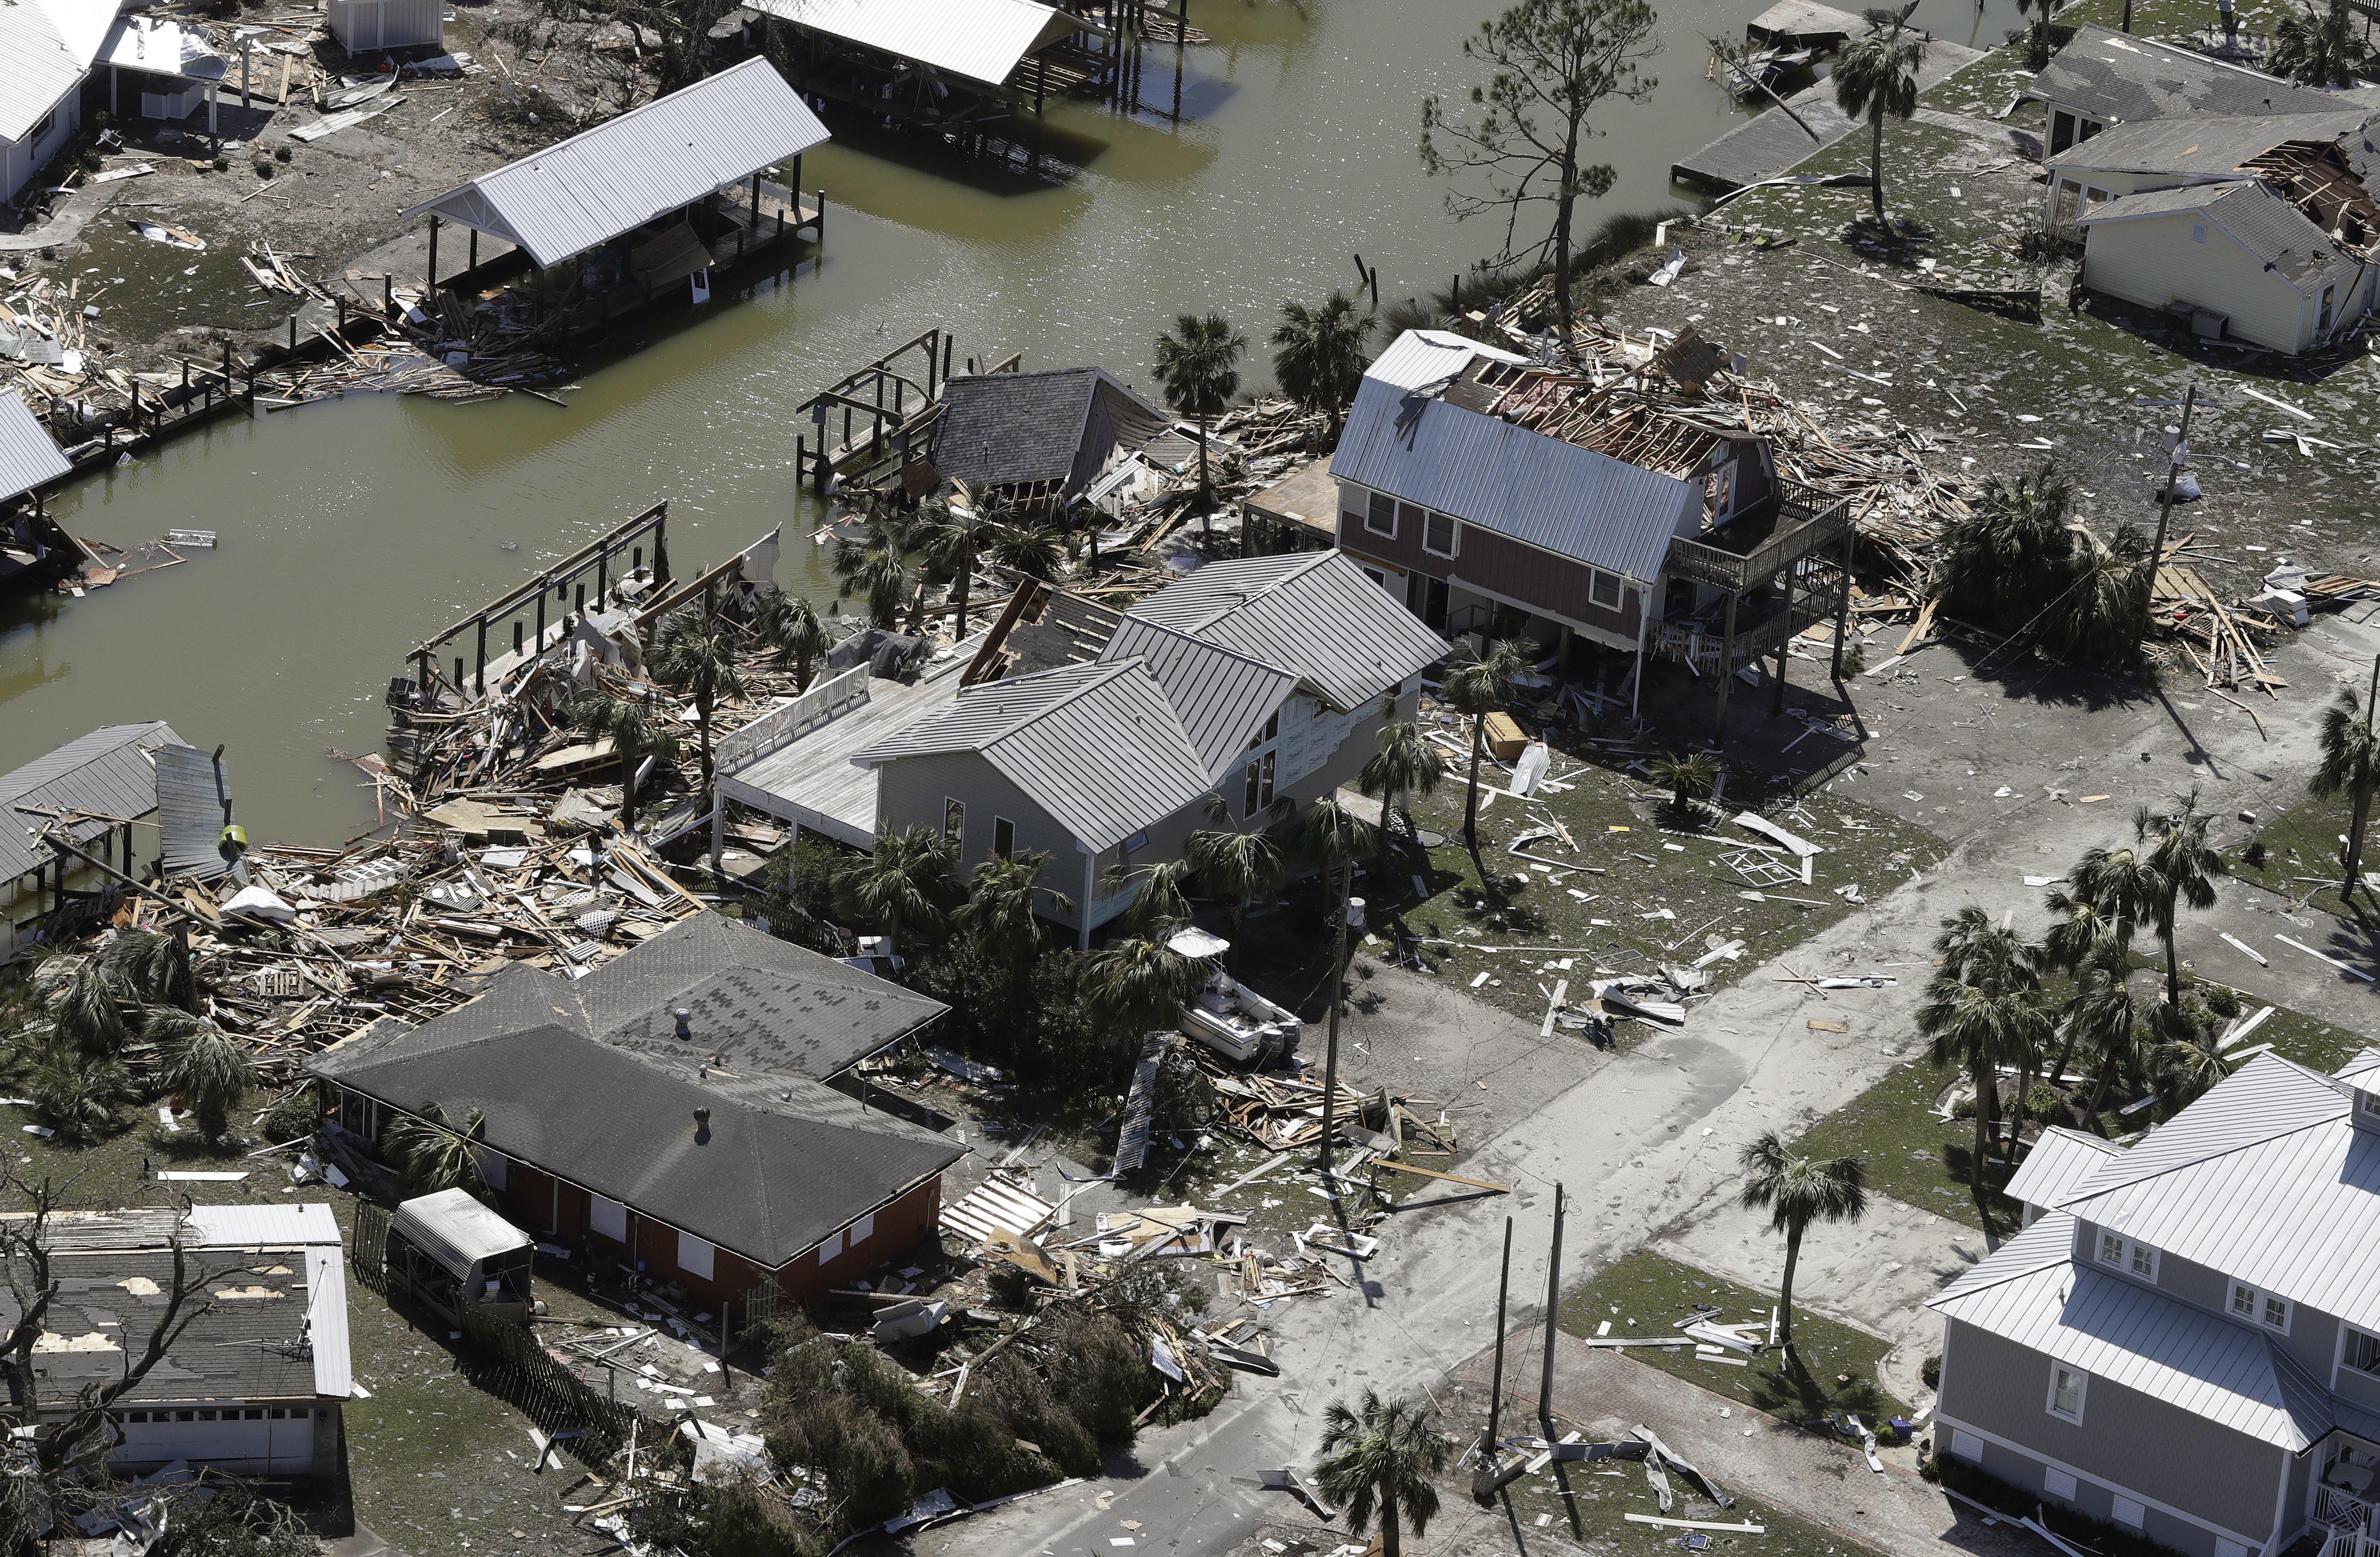 Panama City Fl Death Toll From Hurricane Michael Rises